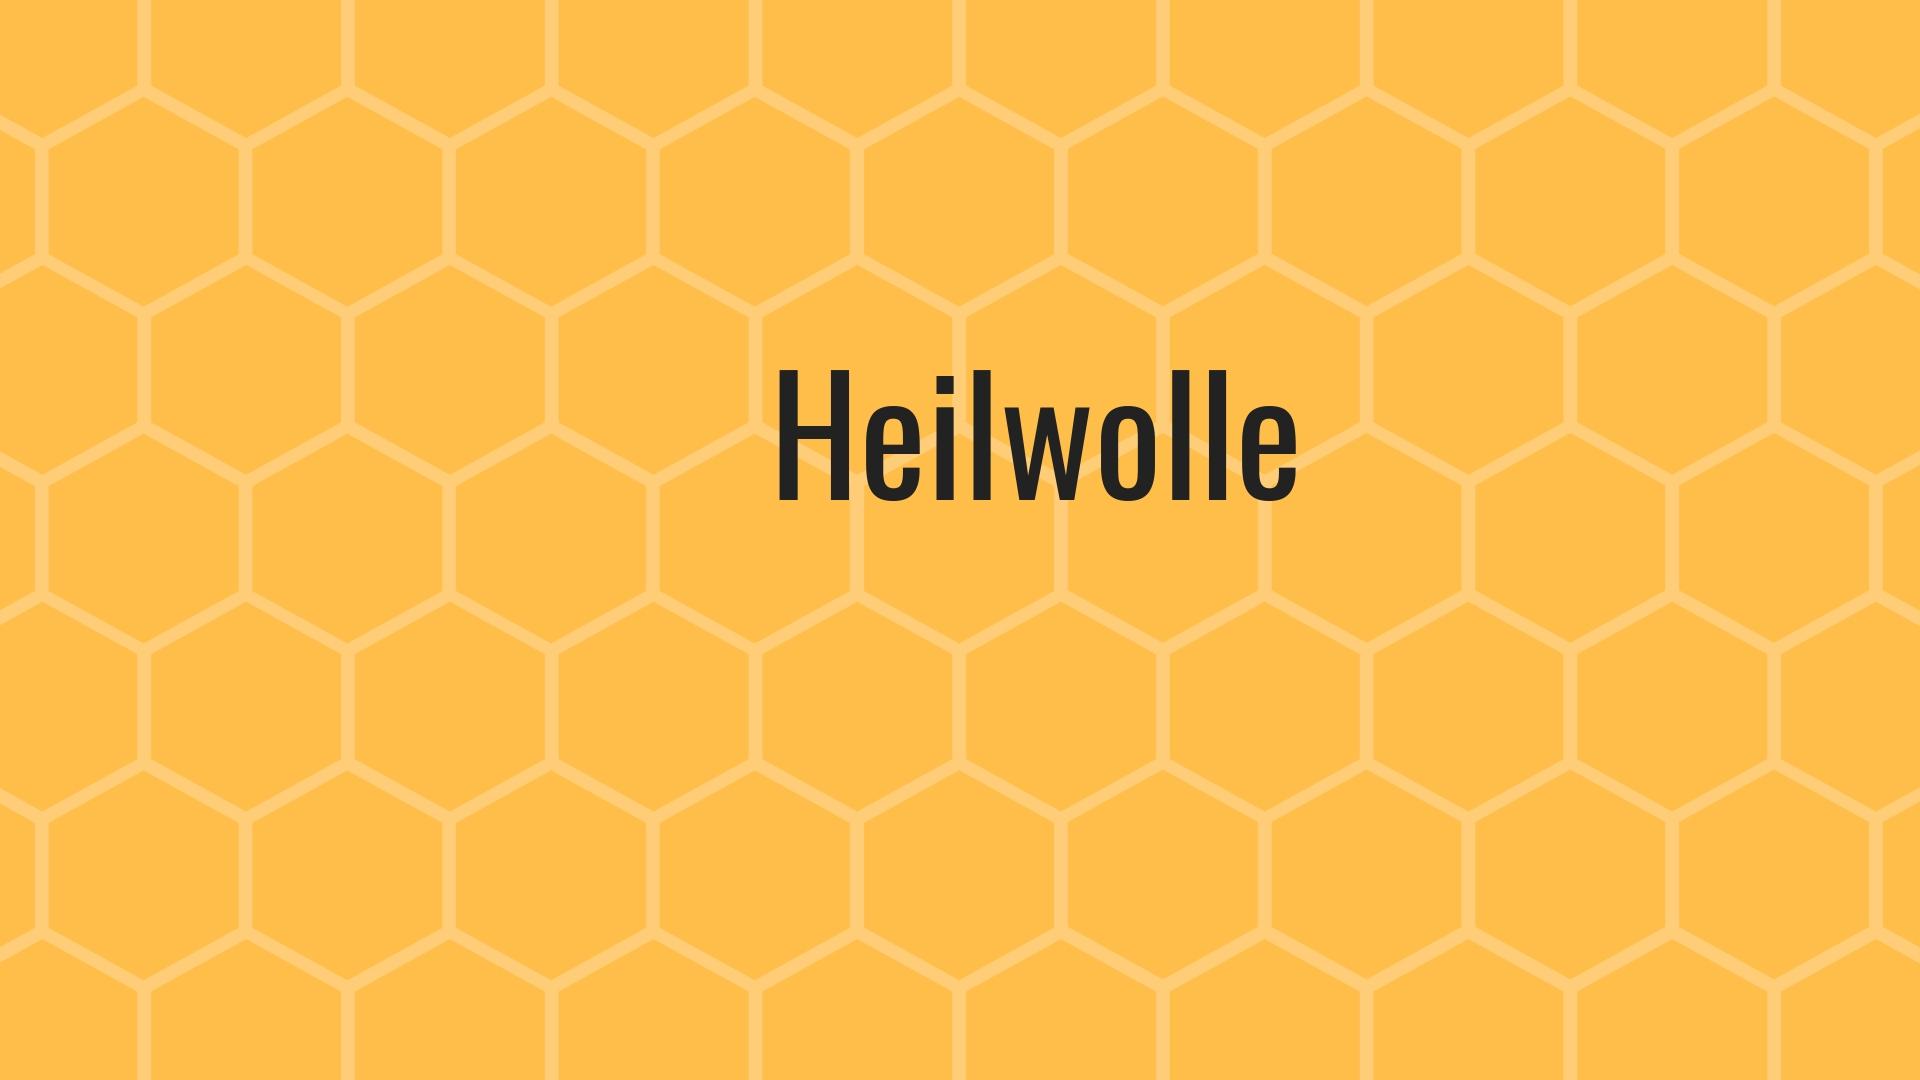 Video Heilwolle bei YouTube